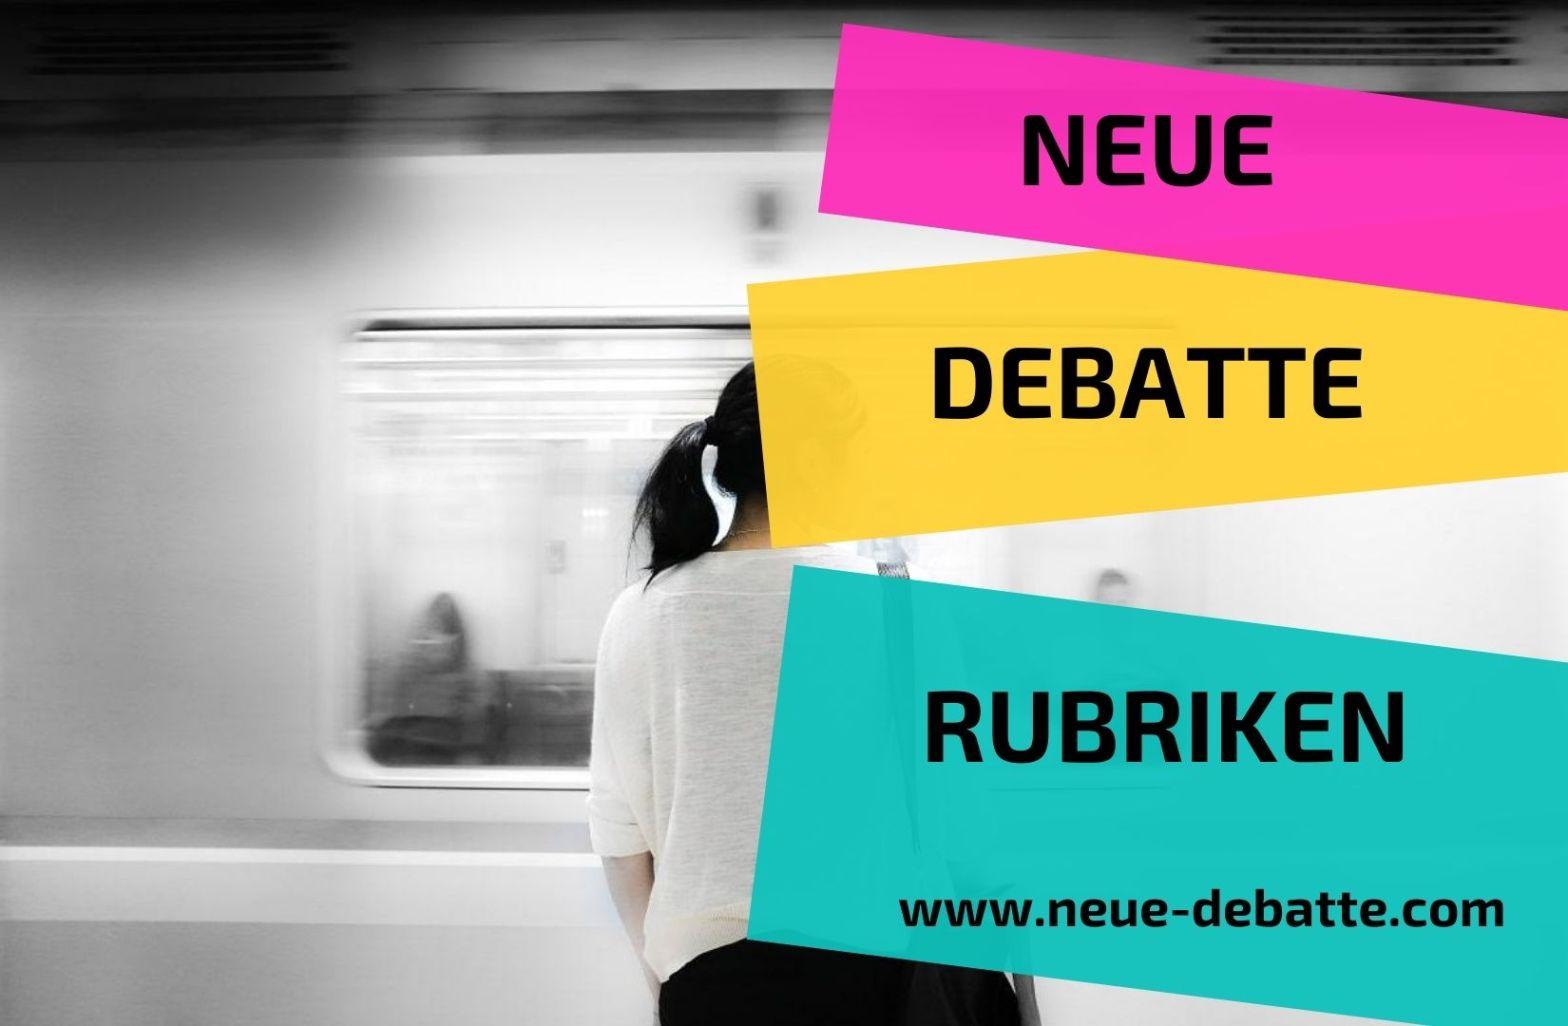 Rubriken Neue Debatte